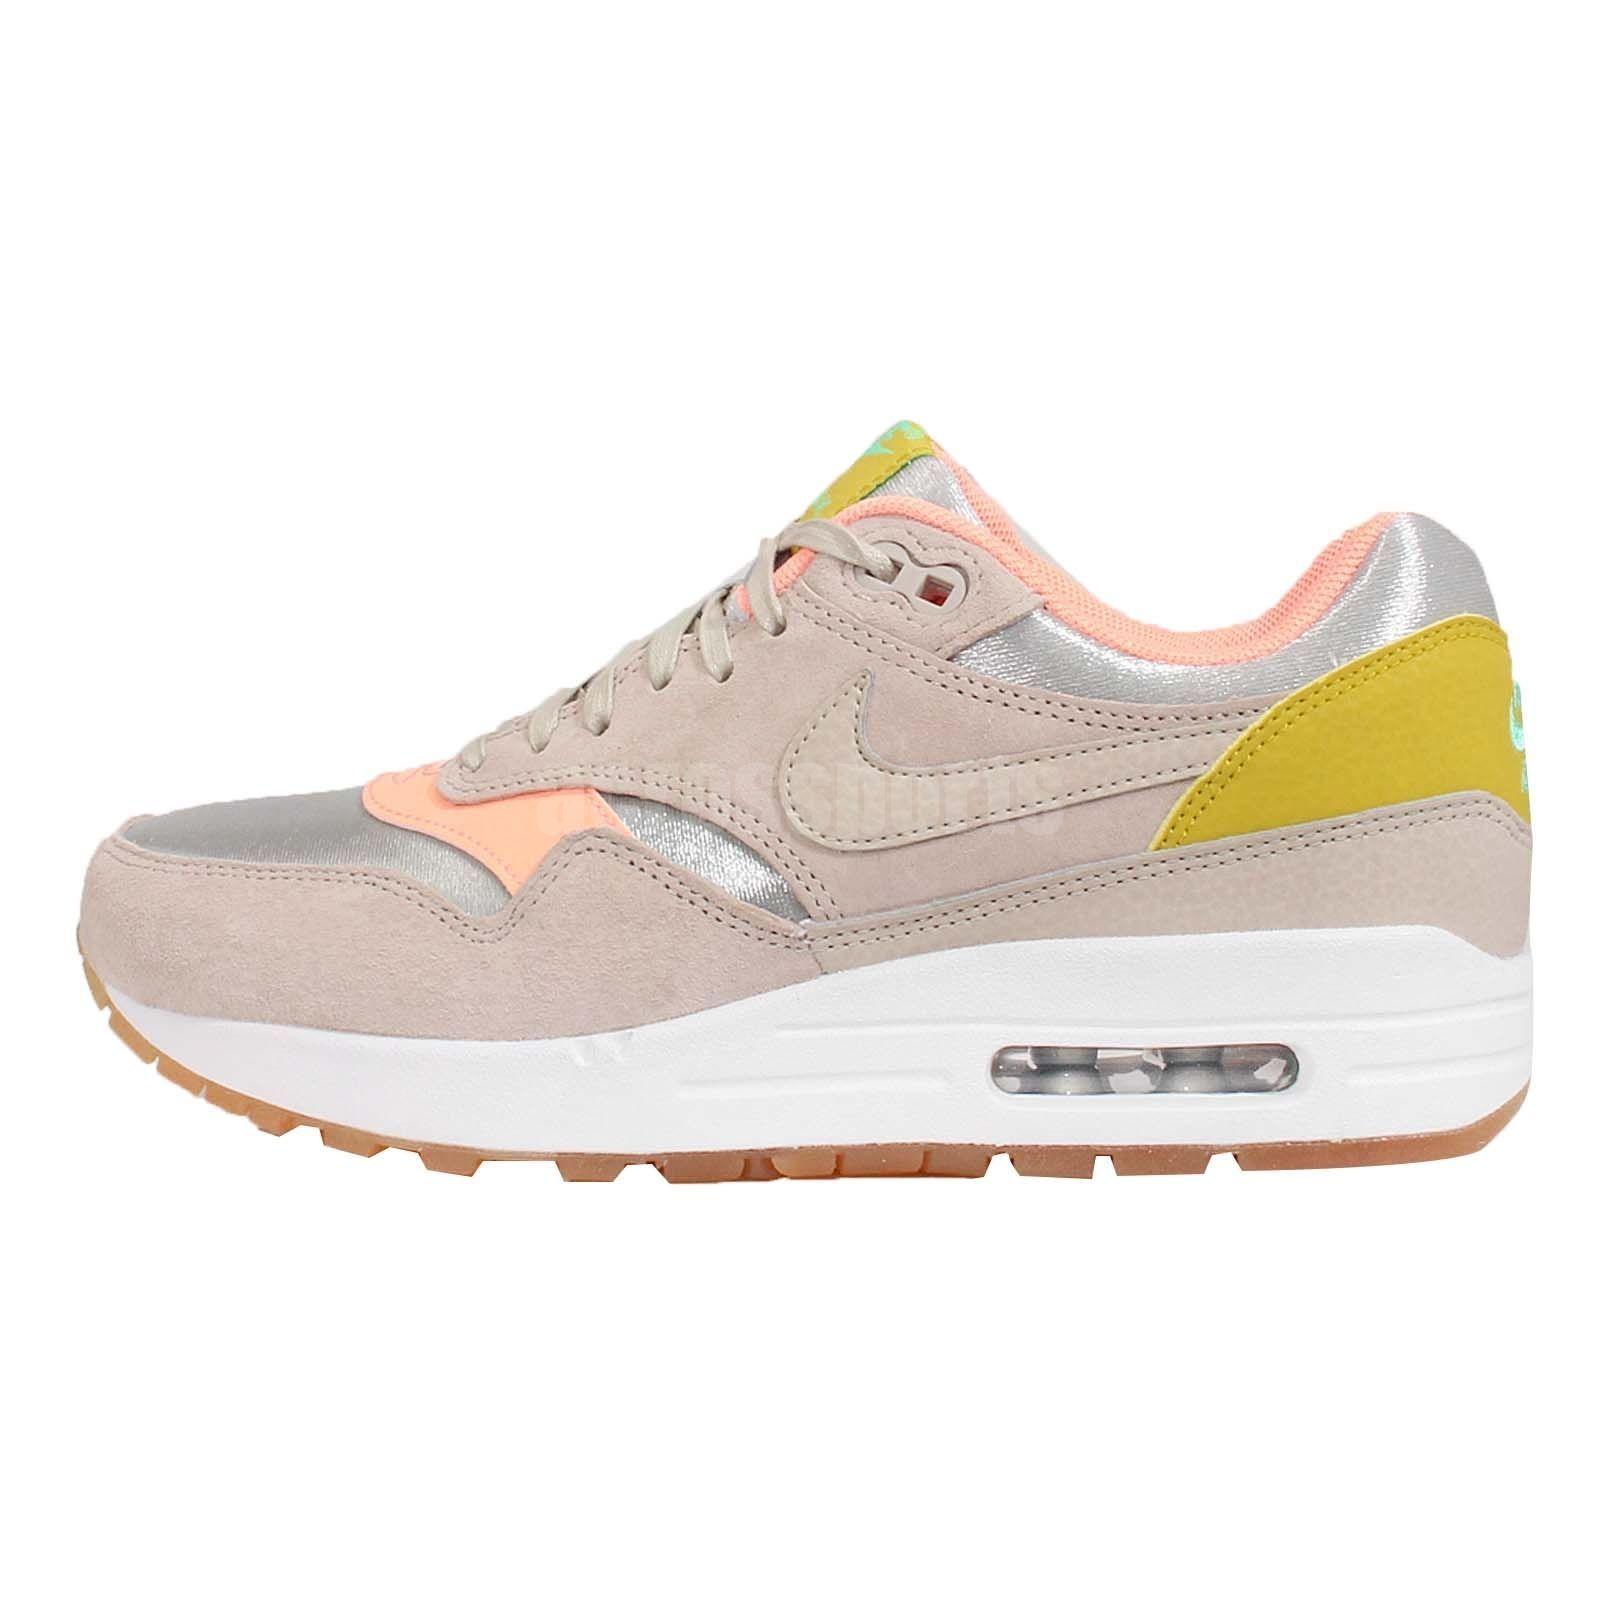 Wmns Nike Air Max 1 PRM Premium Sunset Glow NSW Womens Running Shoes ... c235ac666e856